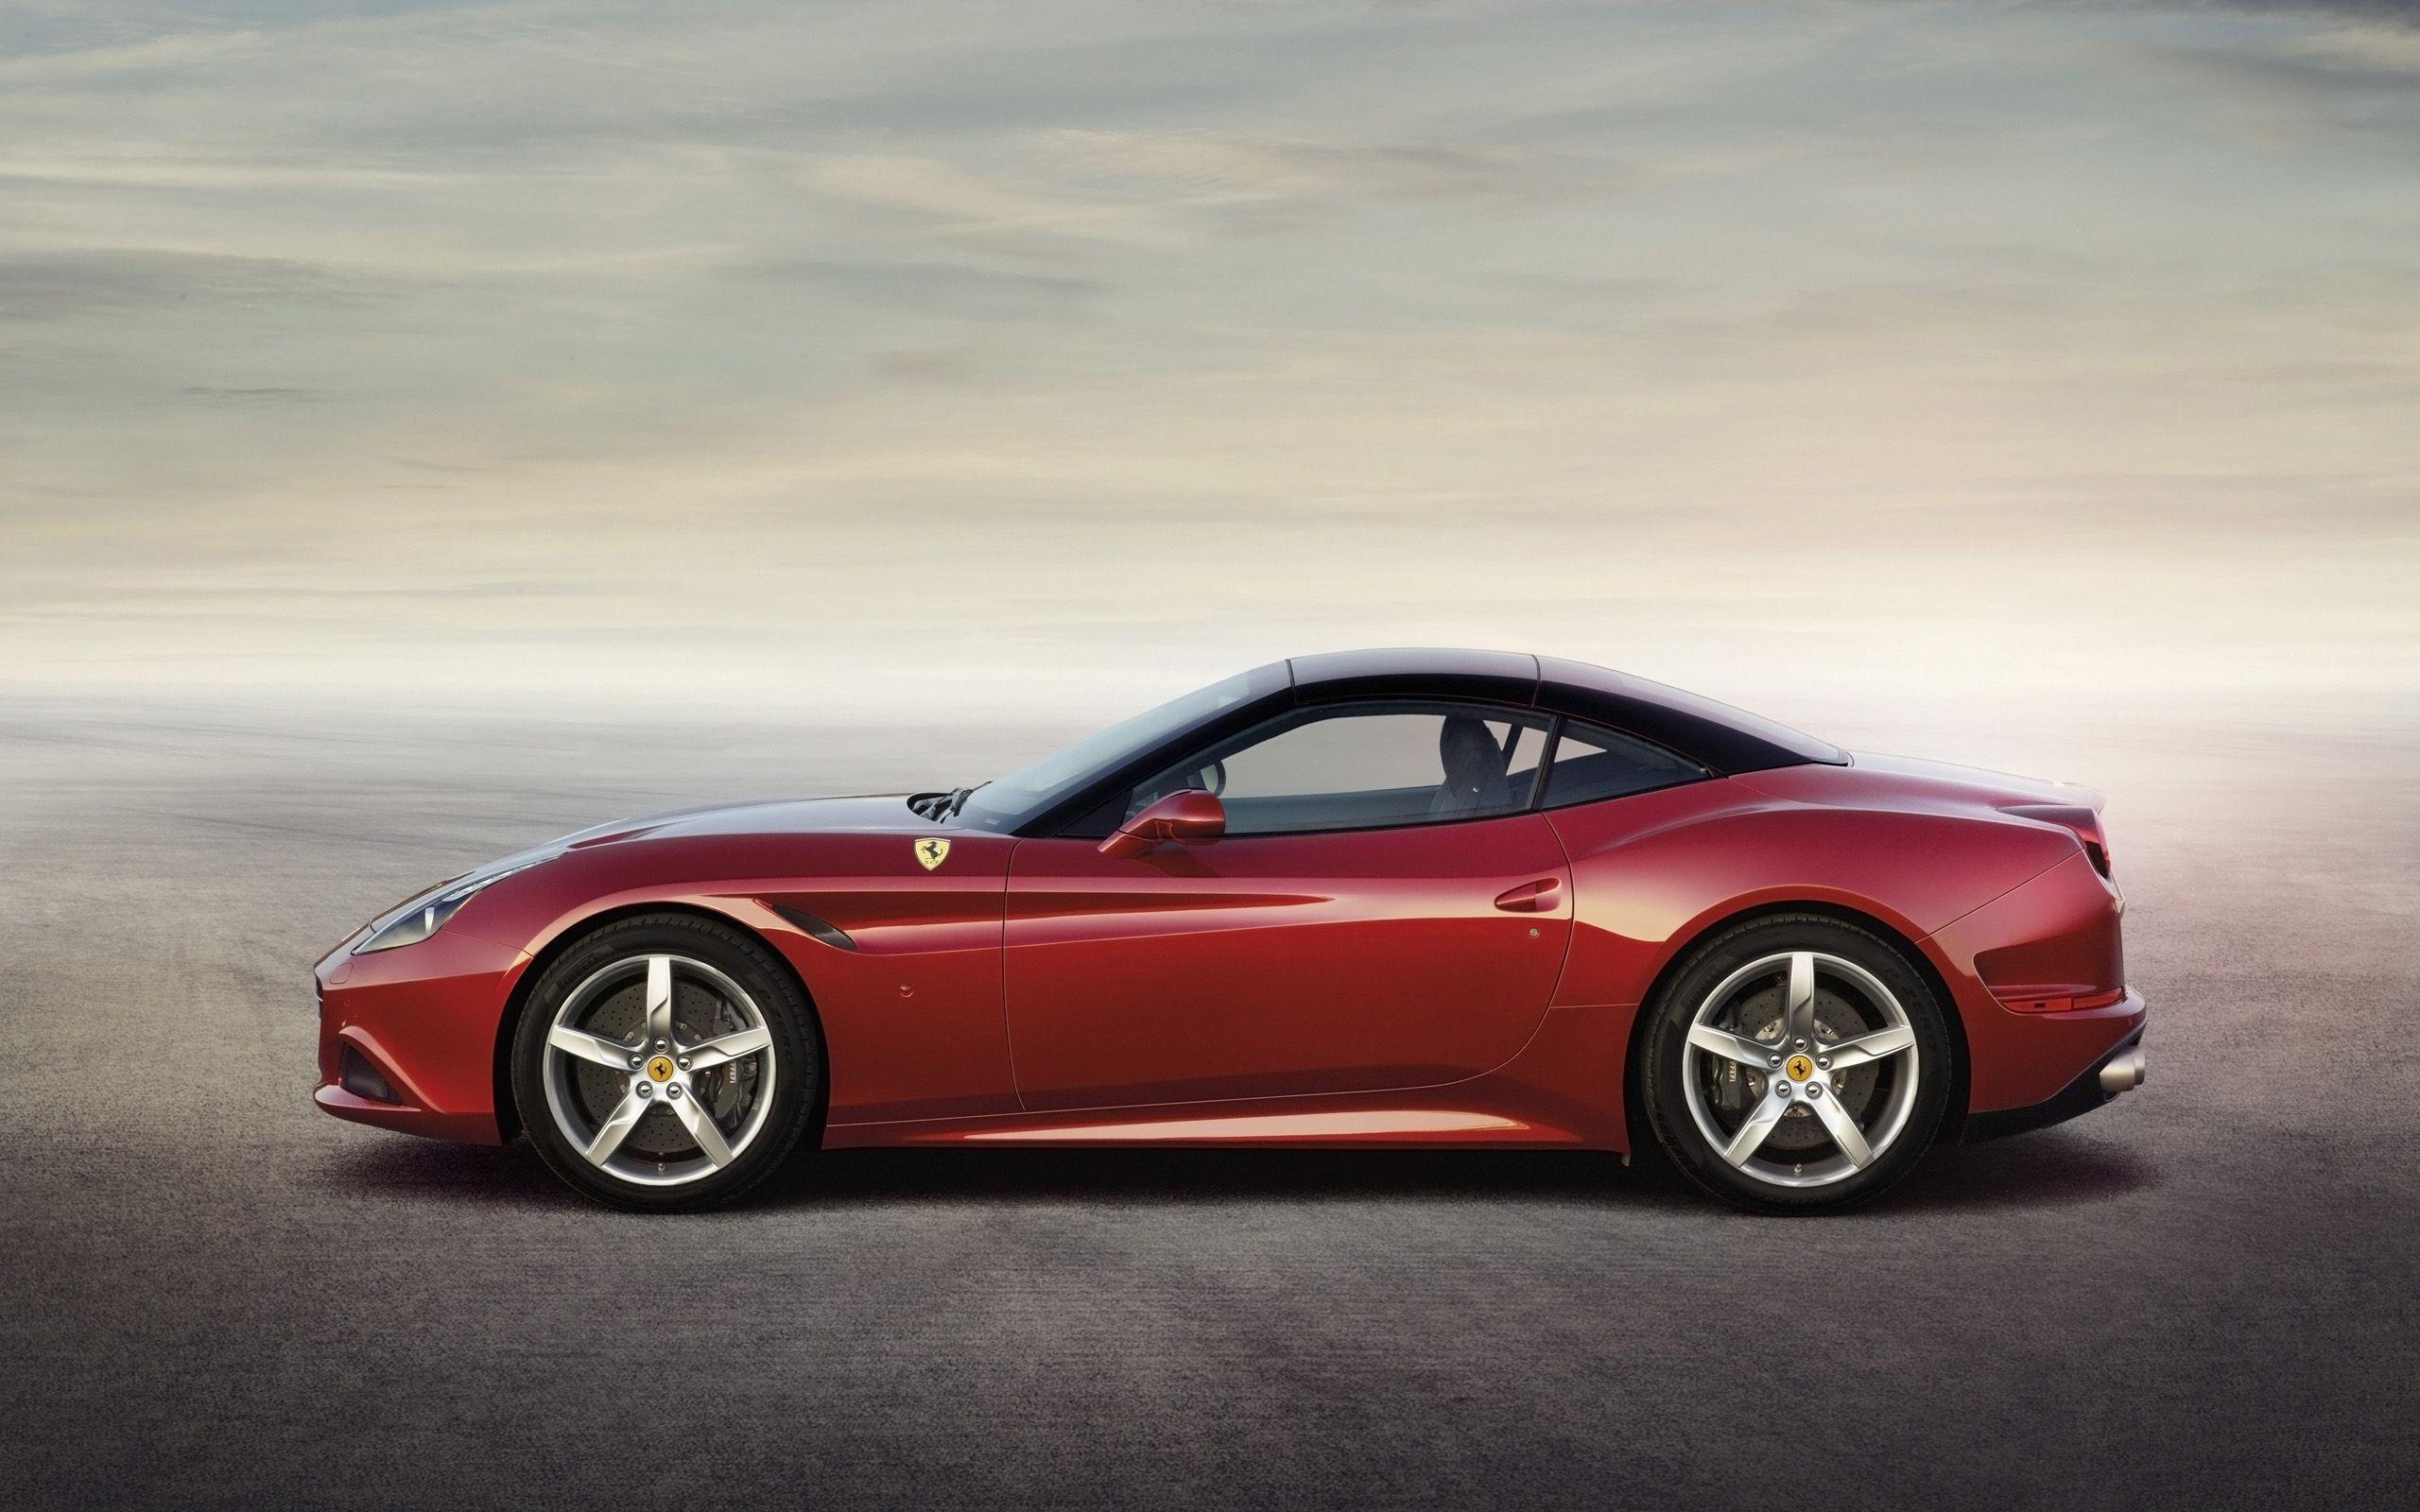 2014 Ferrari California T Wallpaper Free Download Resolution